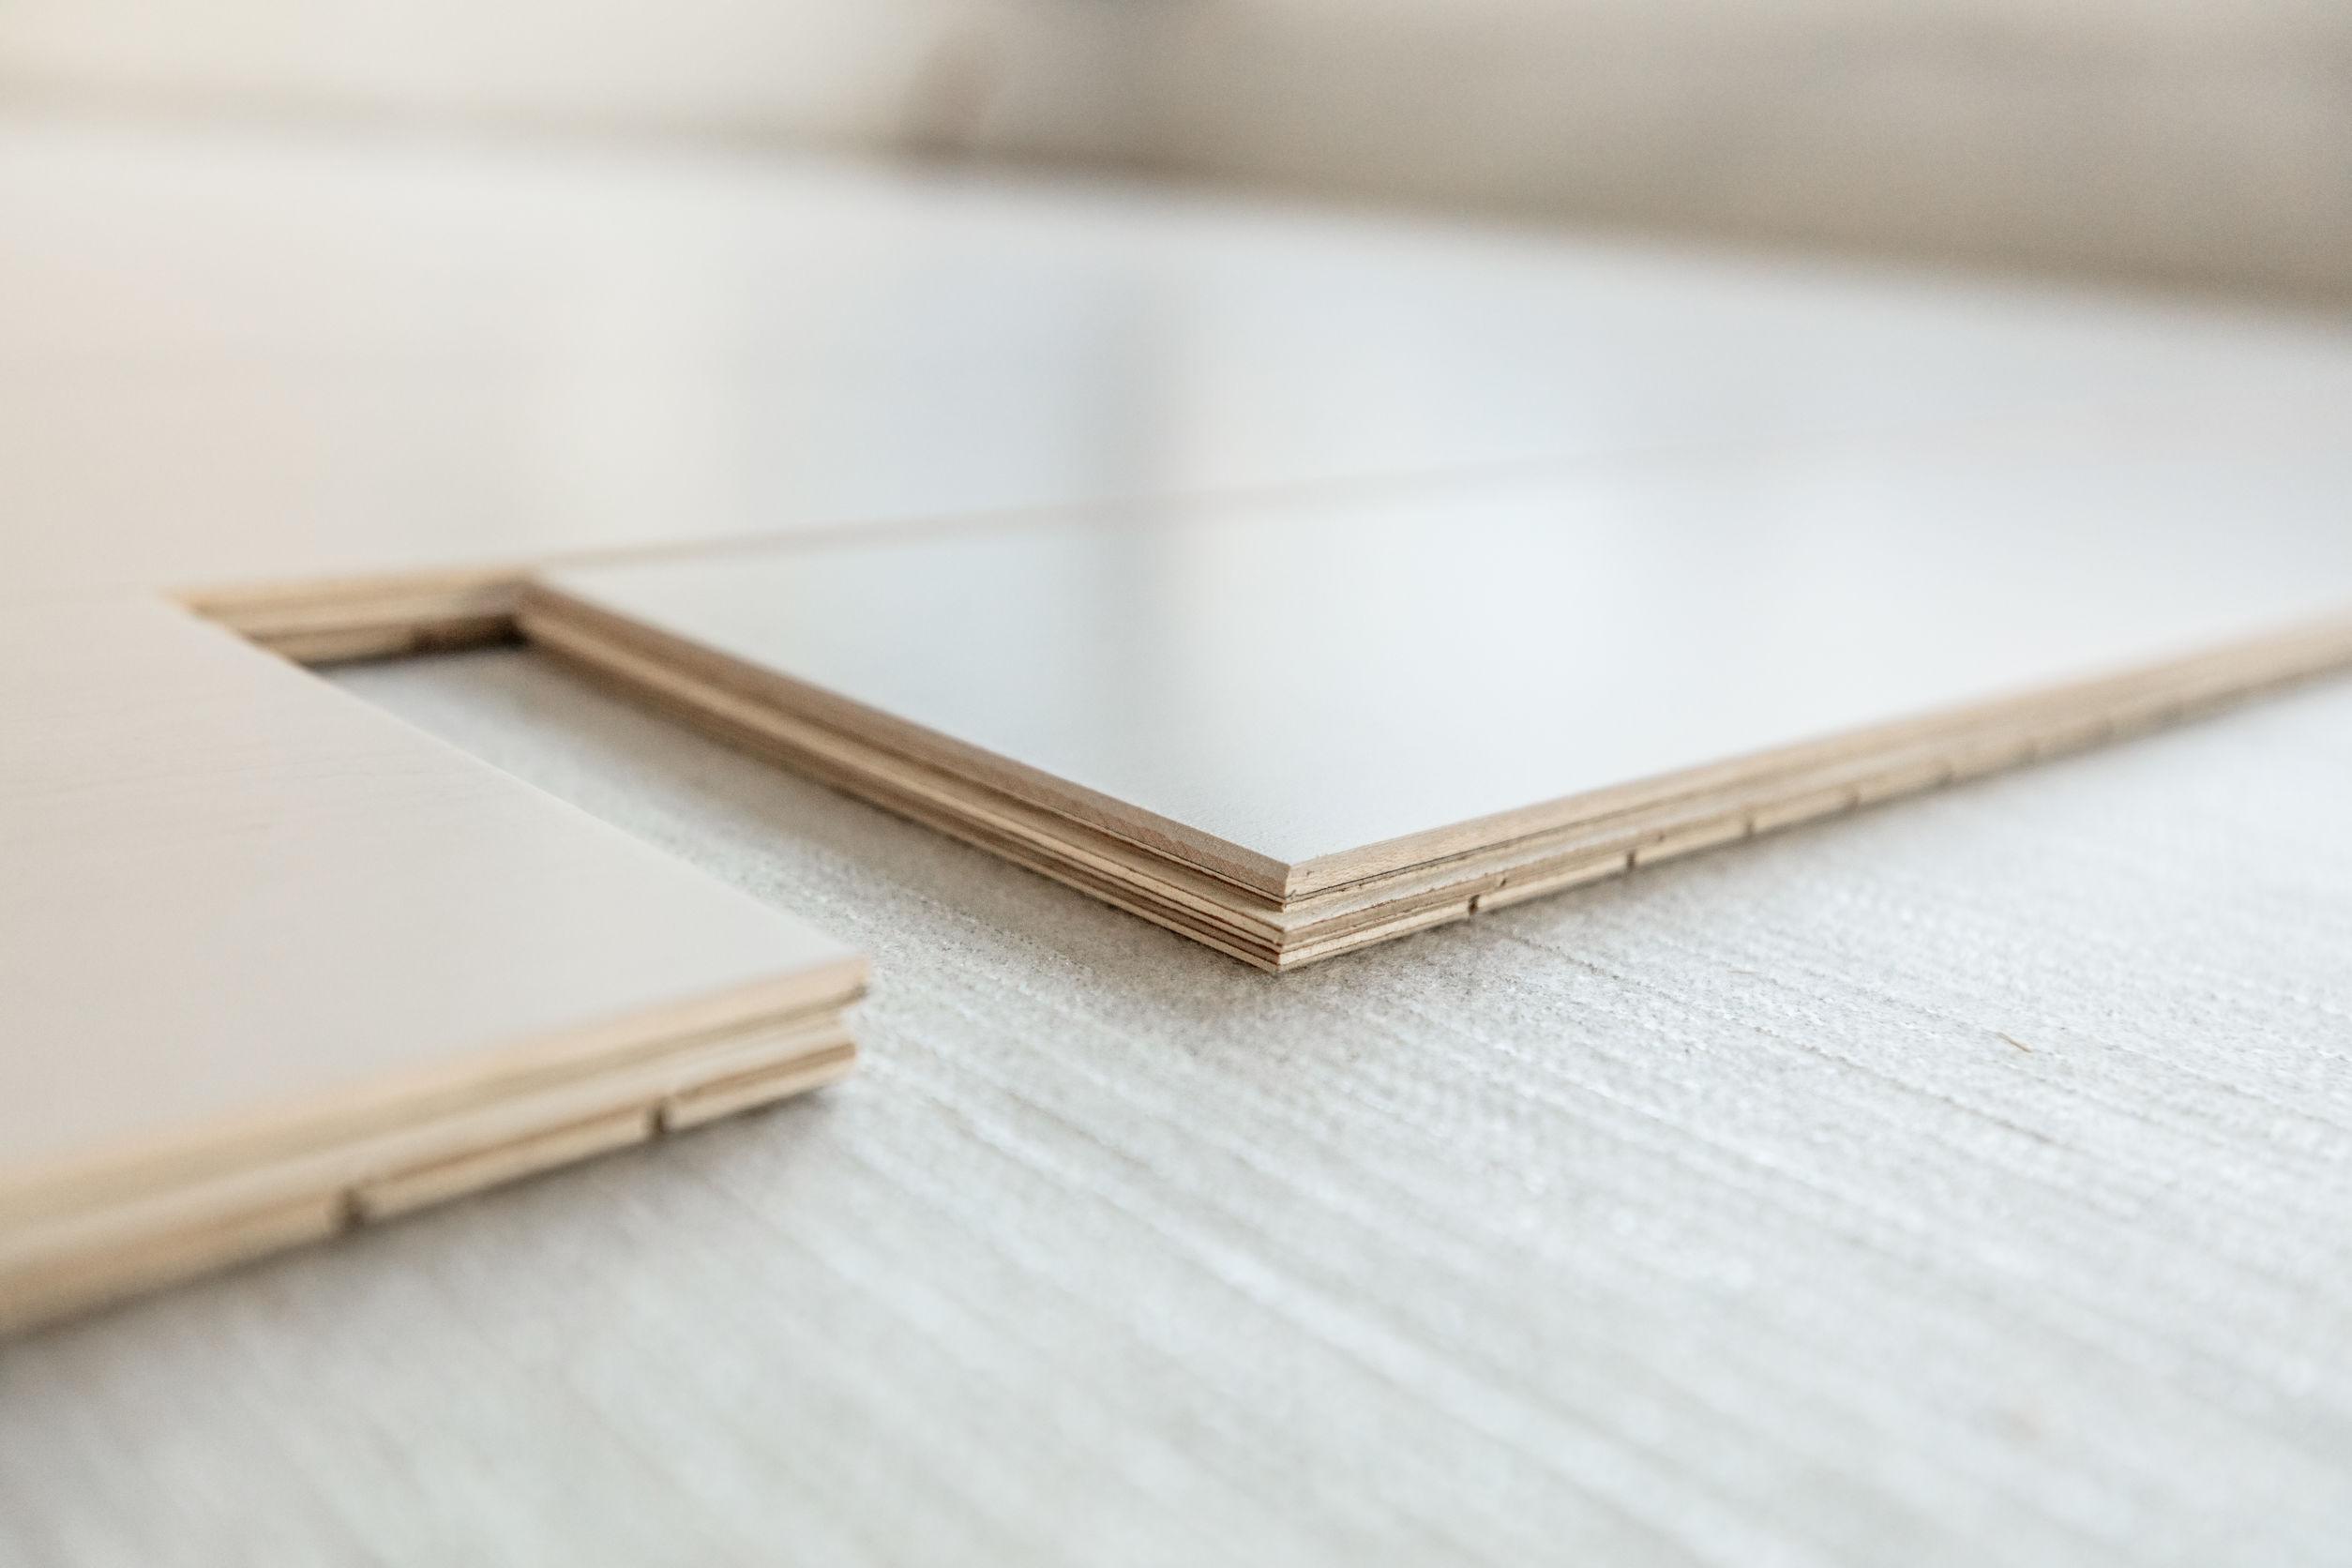 Example of Engineered Wood Flooring